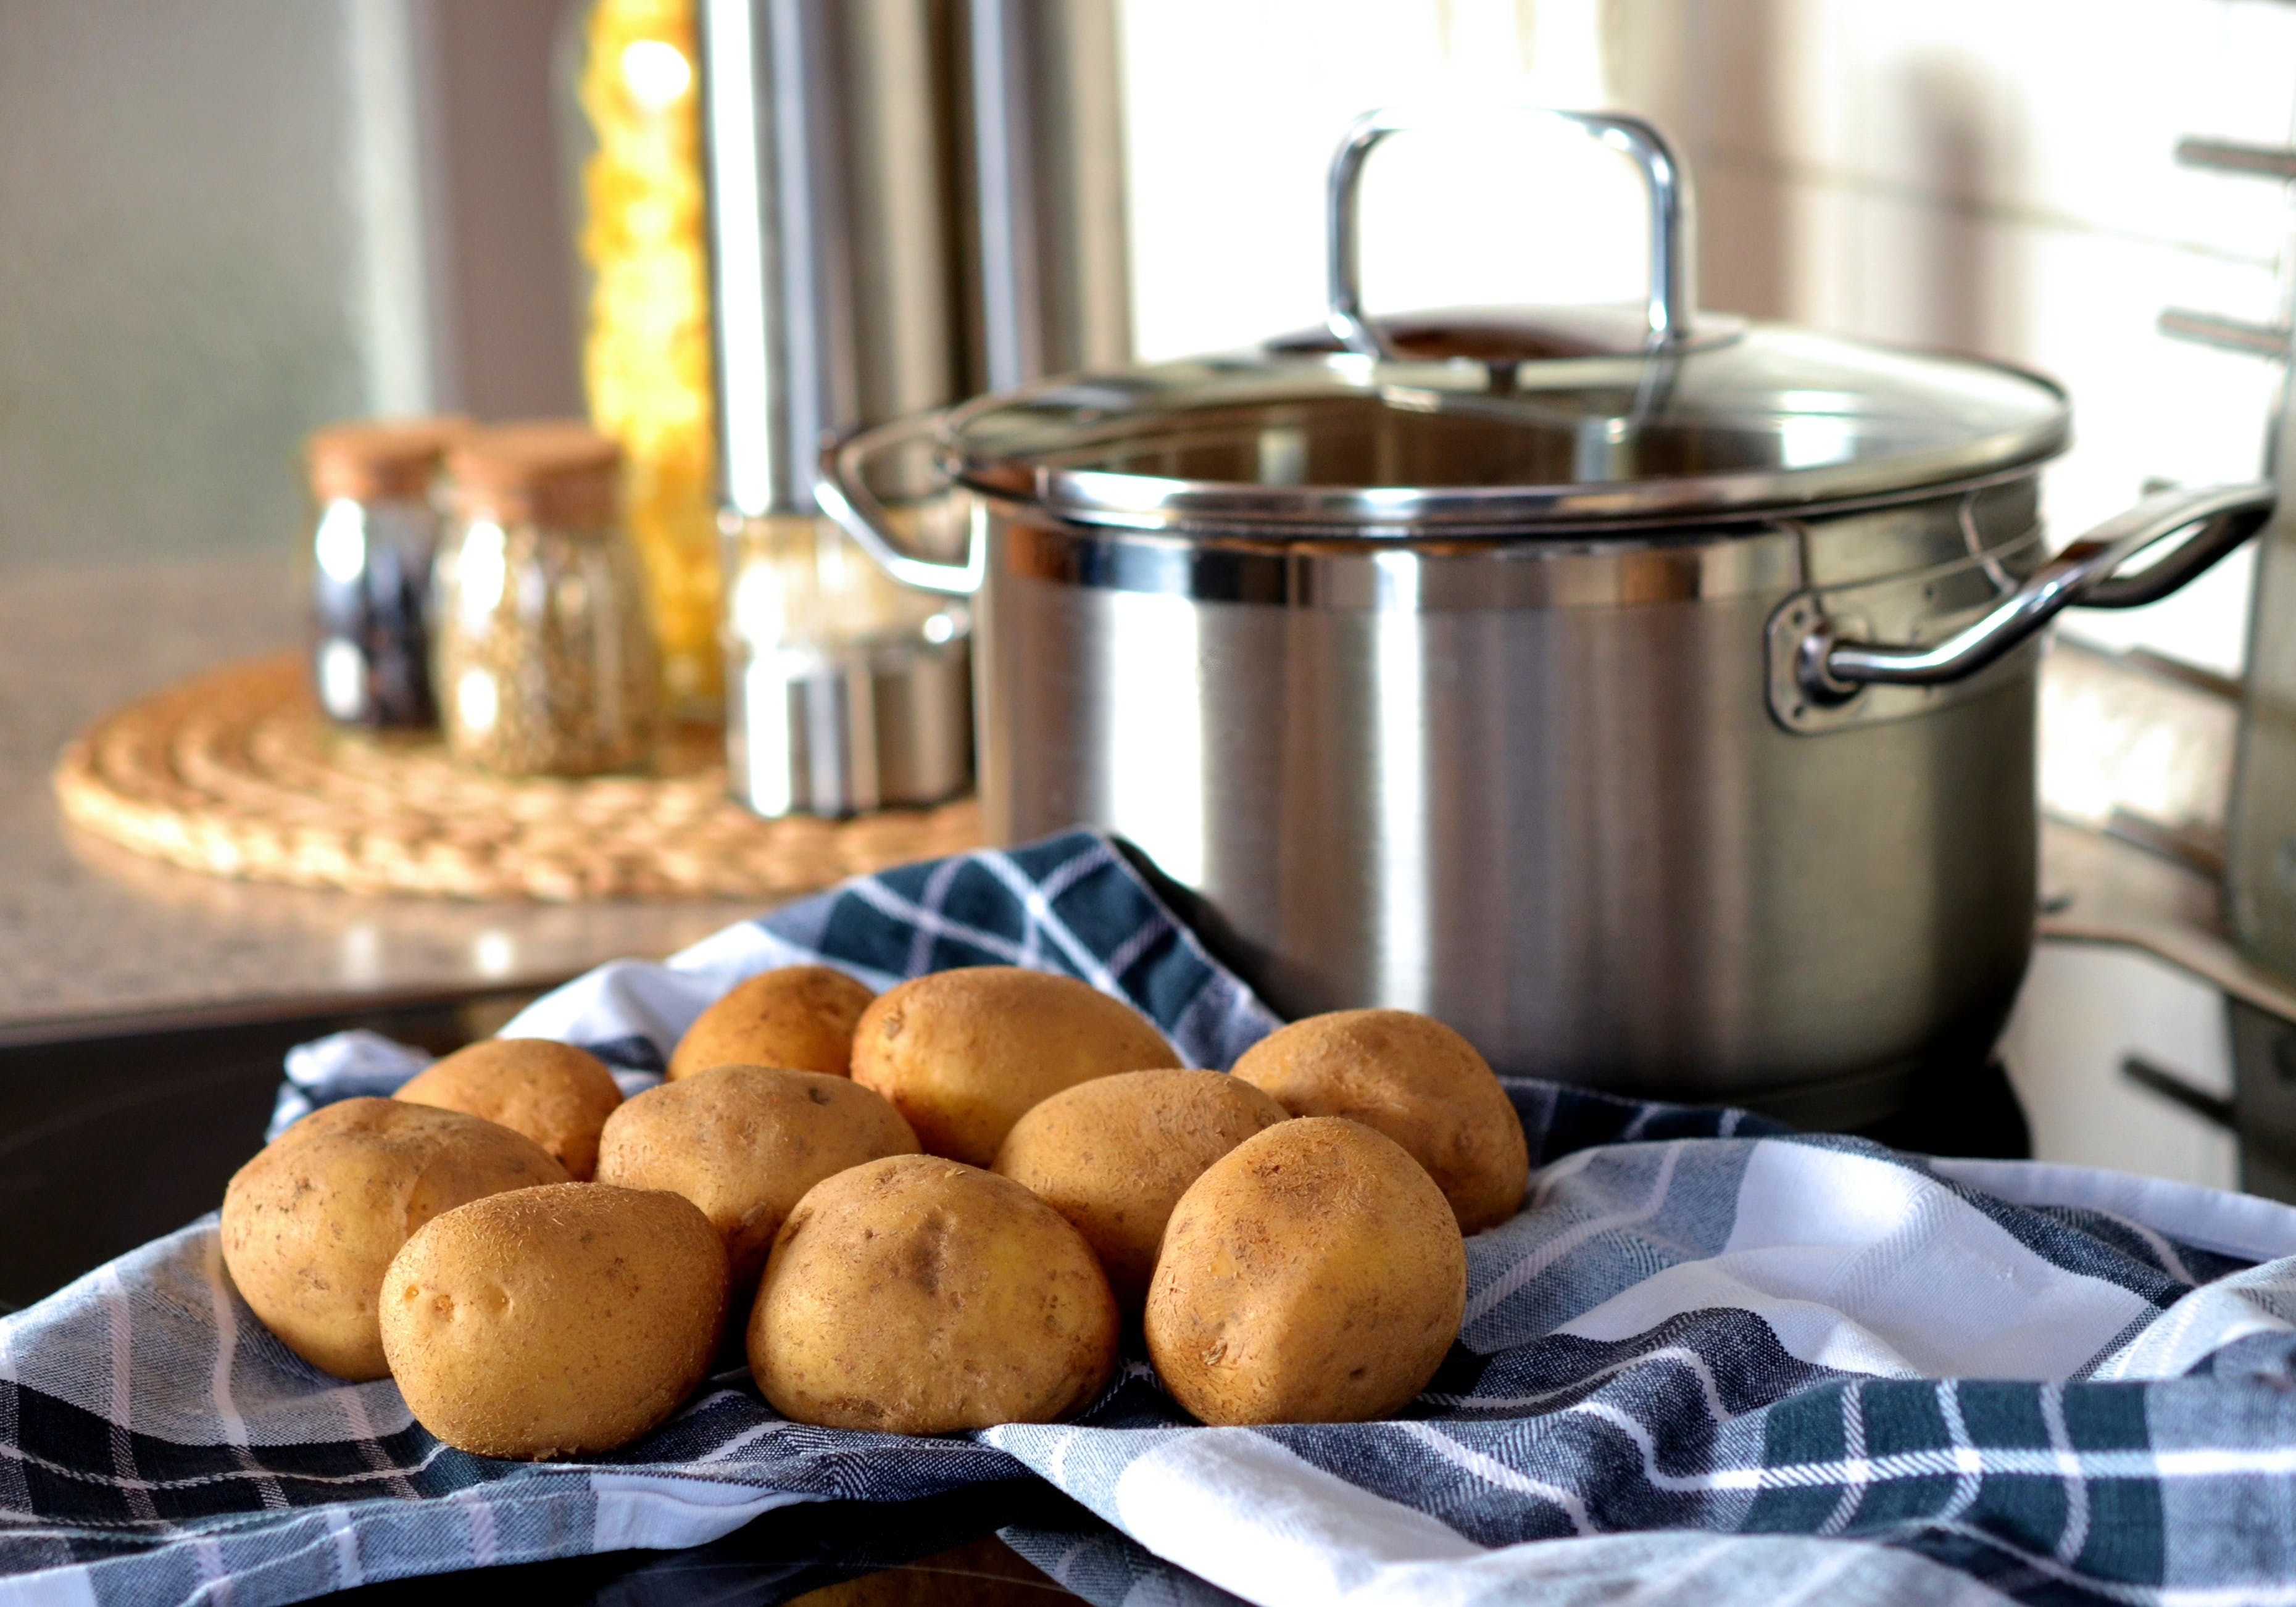 Foto stok gratis dapur, kentang, kontainer, makanan